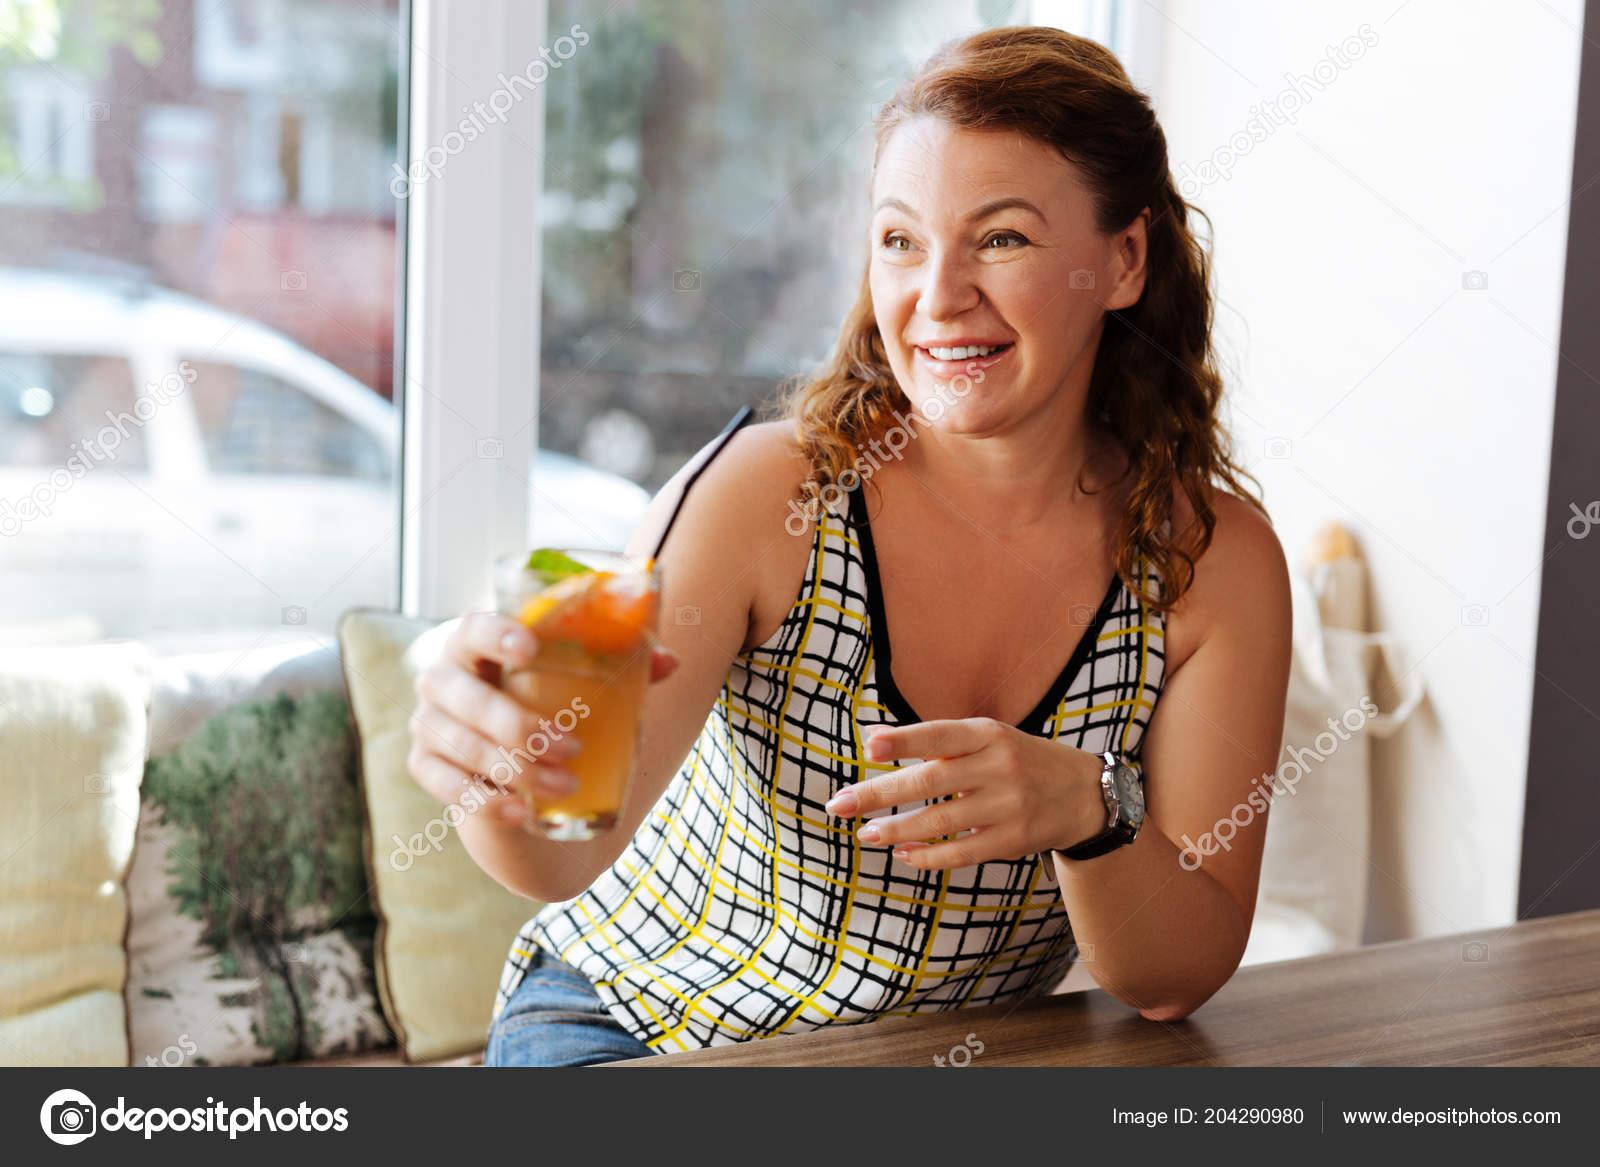 b504e089b5cc Κοκκινομάλλης γυναίκα ακτινοβολούν φορώντας κομψά πολύχρωμα μπλούζα  πίνοντας κοκτέιλ στο εστιατόριο — Εικόνα από ...